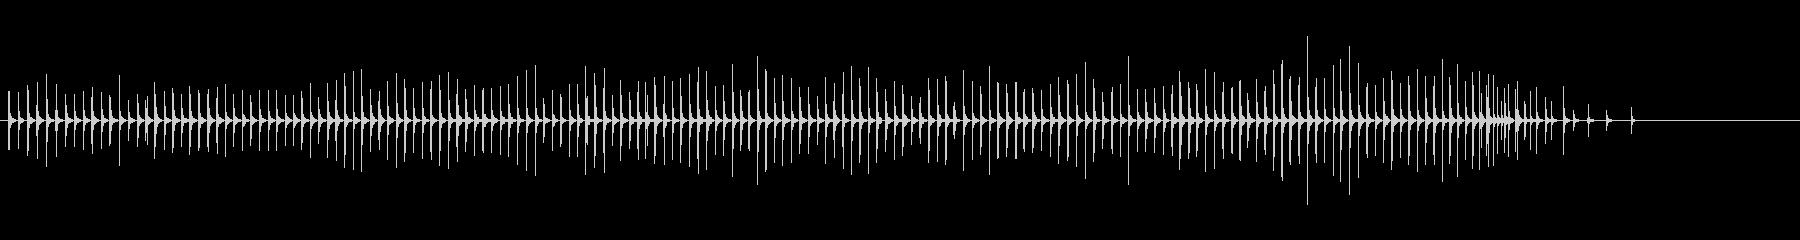 木琴12歌舞伎黒御簾下座音楽和風日本マリの未再生の波形